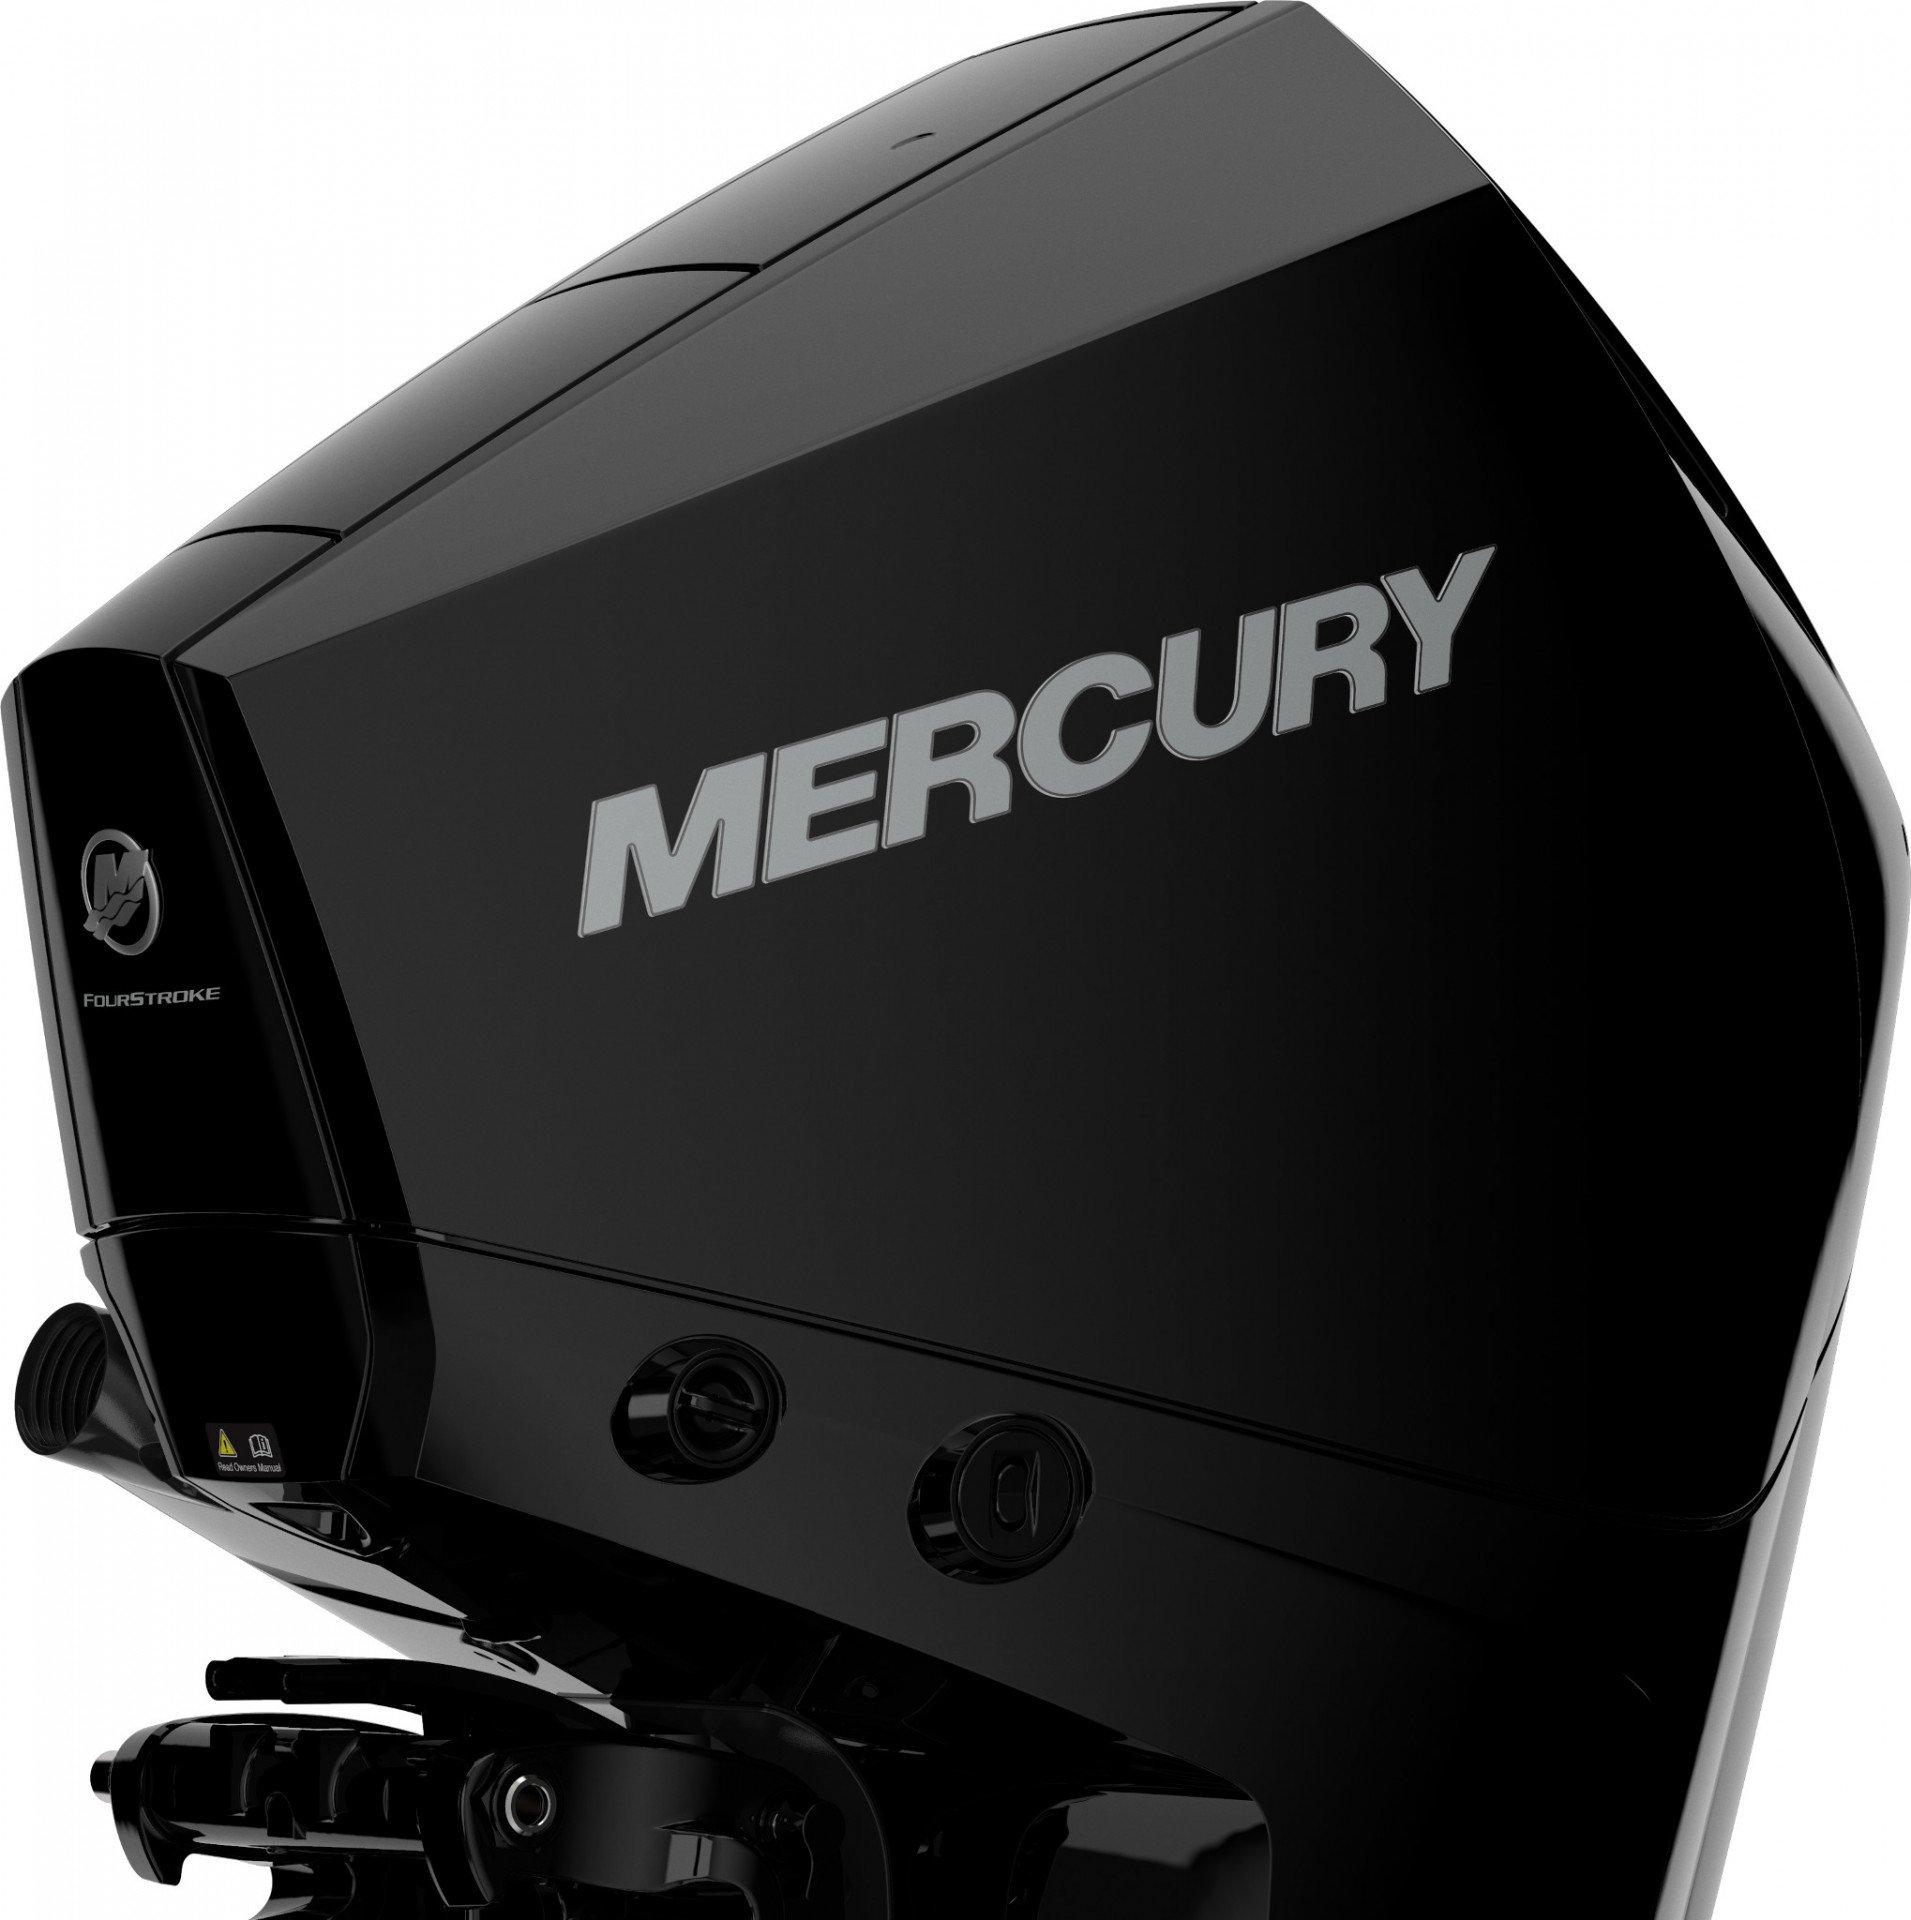 Mercury F 225 L V6